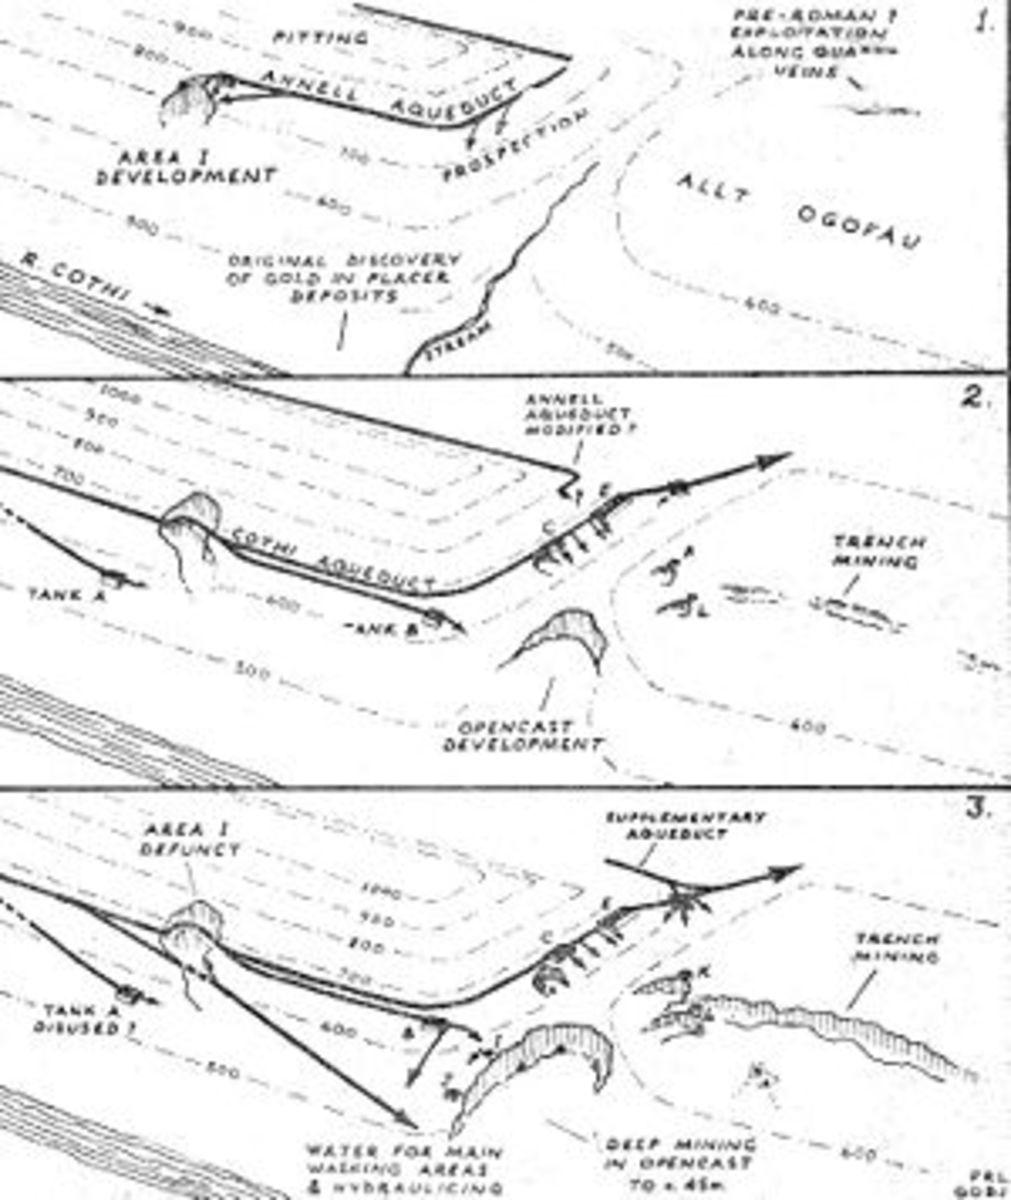 The development of a Roman gold mine in Whales, United Kingdom